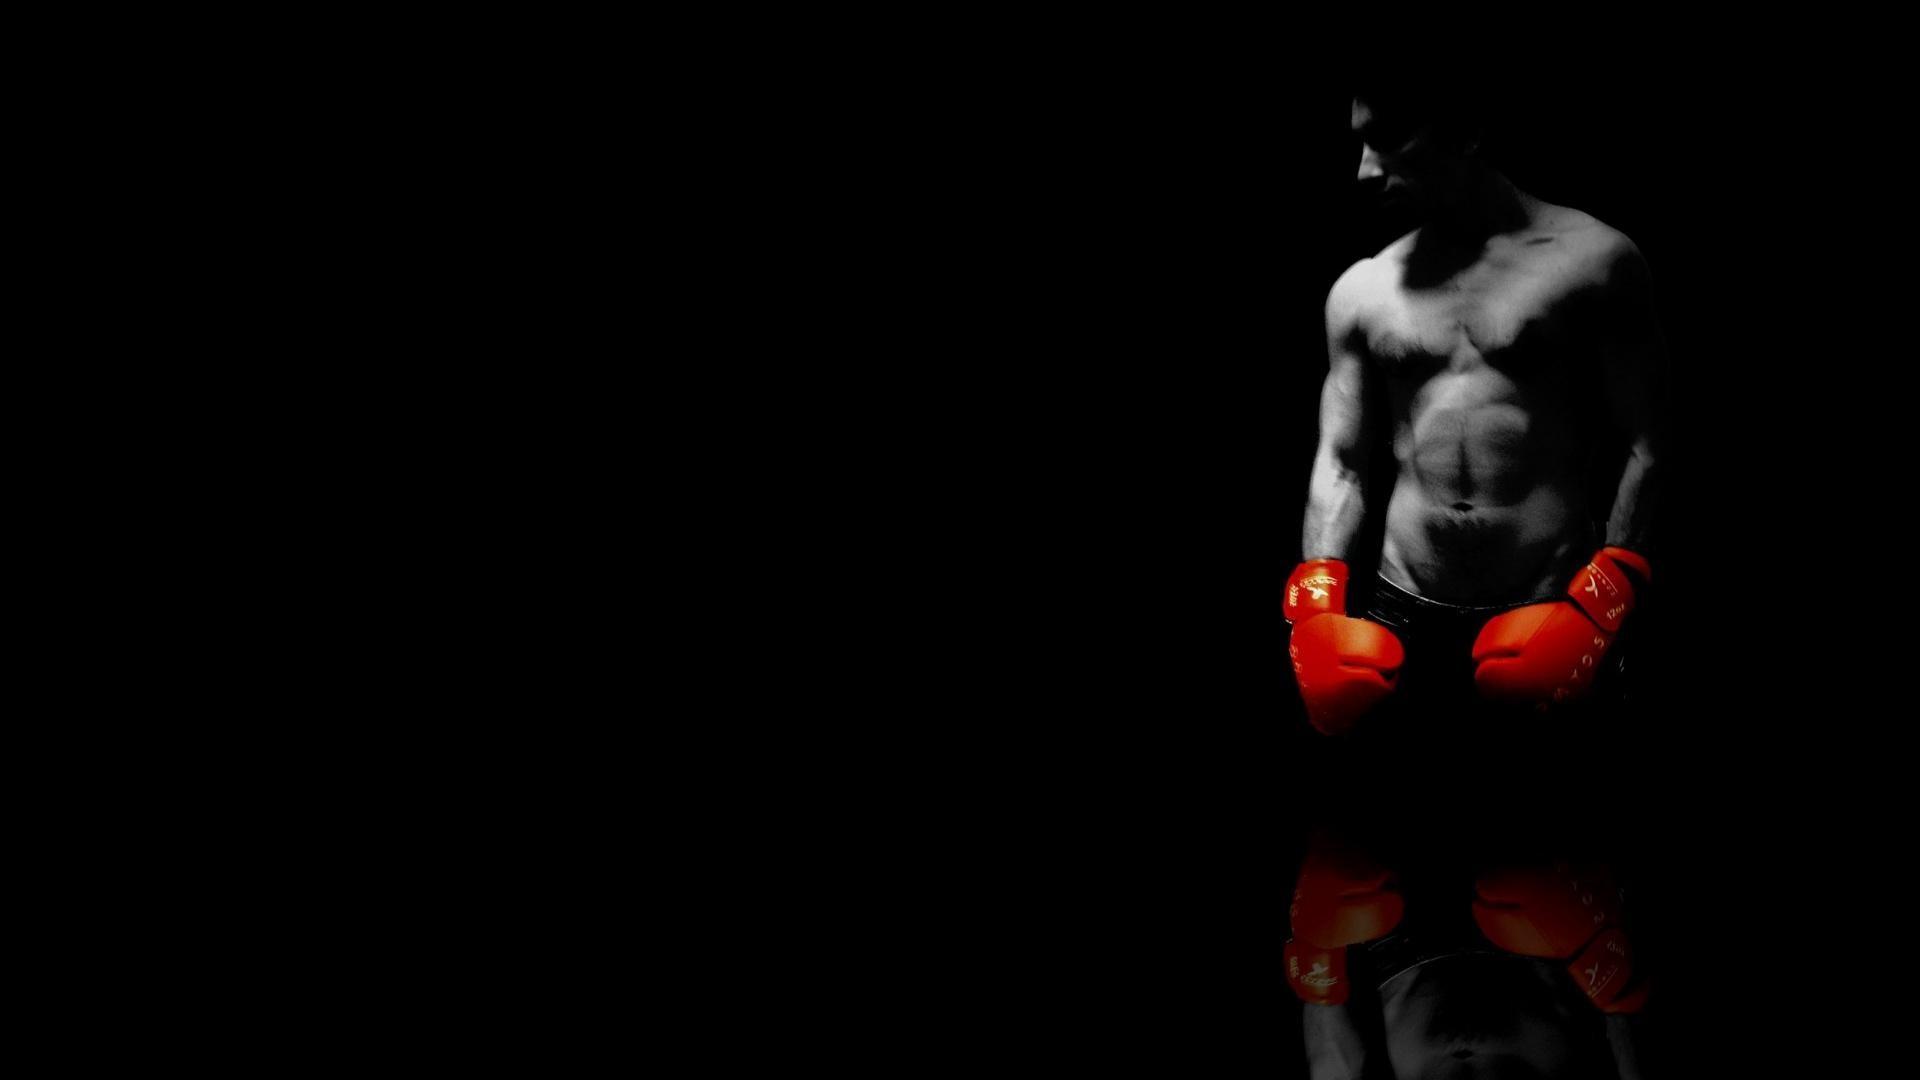 wallpaper.wiki-Free-Boxing-Gloves-Photo-PIC-WPB0013835